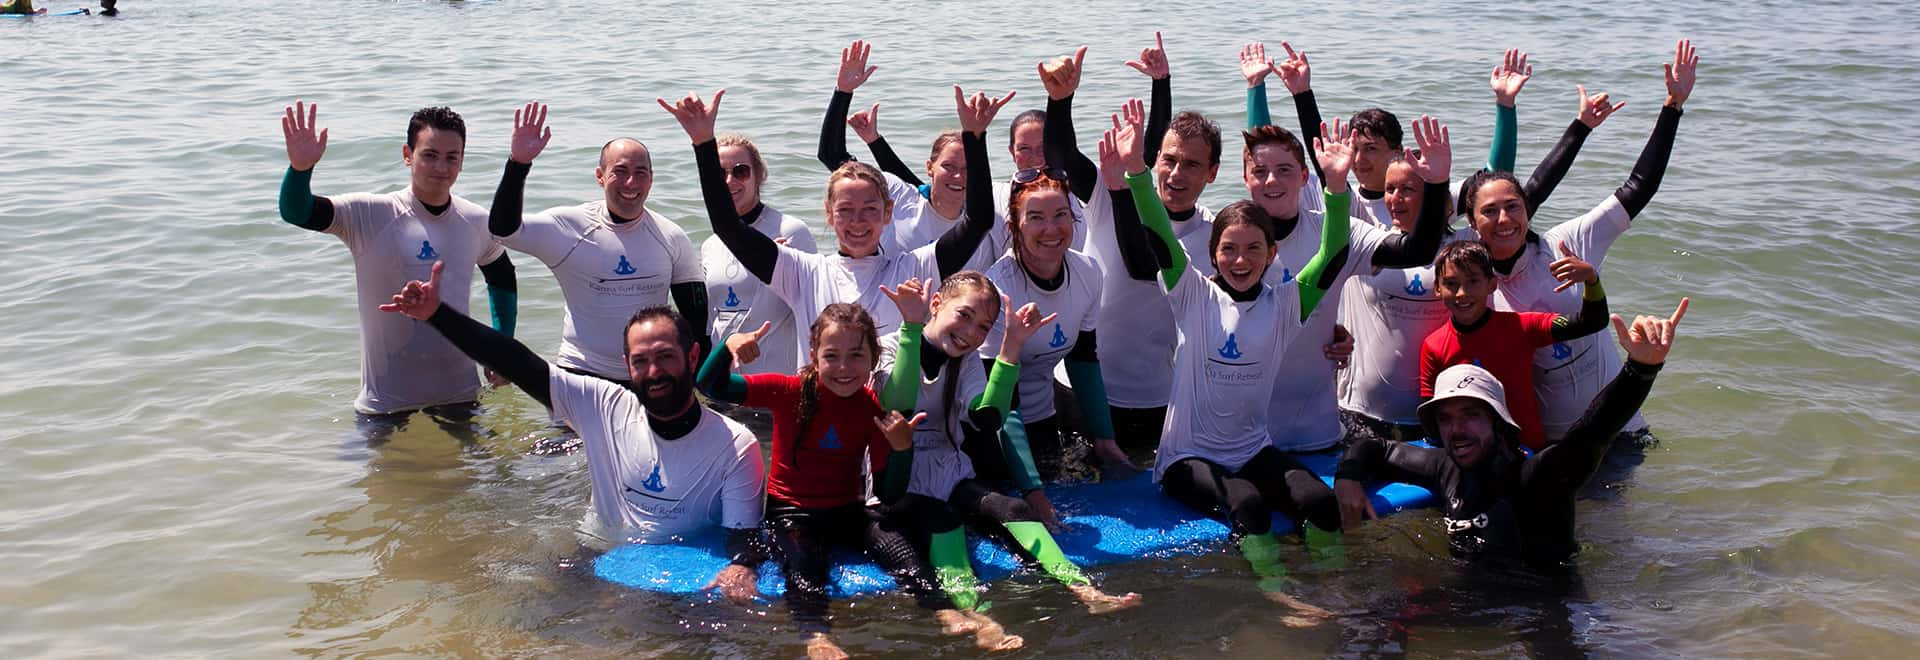 group surf lessons lisbon algarve